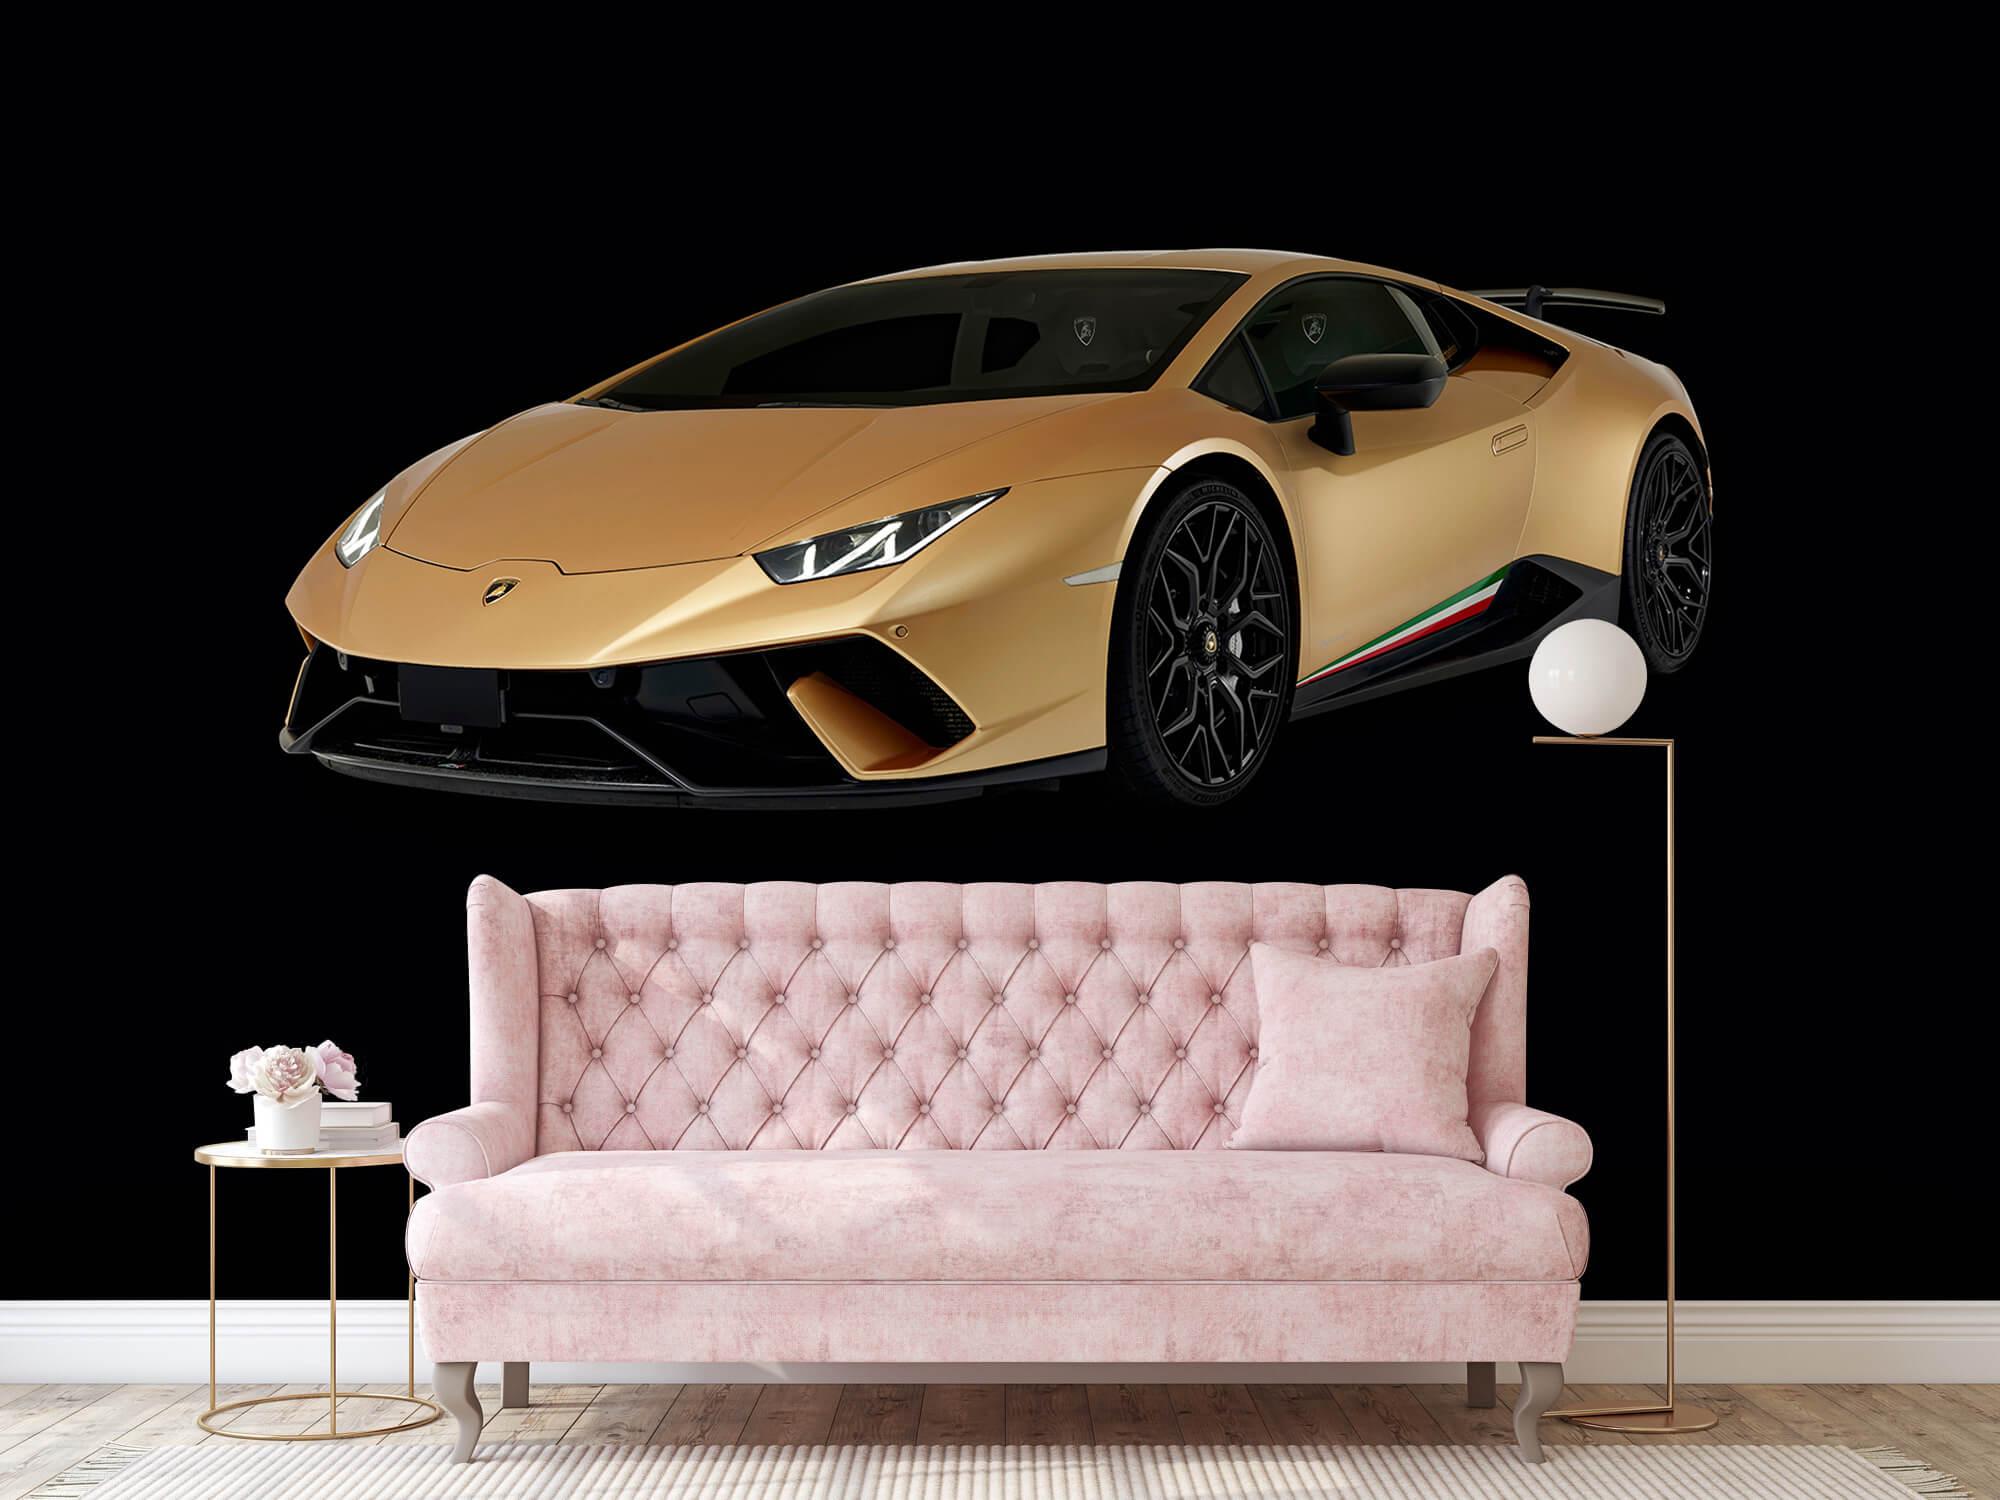 Wallpaper Lamborghini Huracán - Avant droit, noir 13